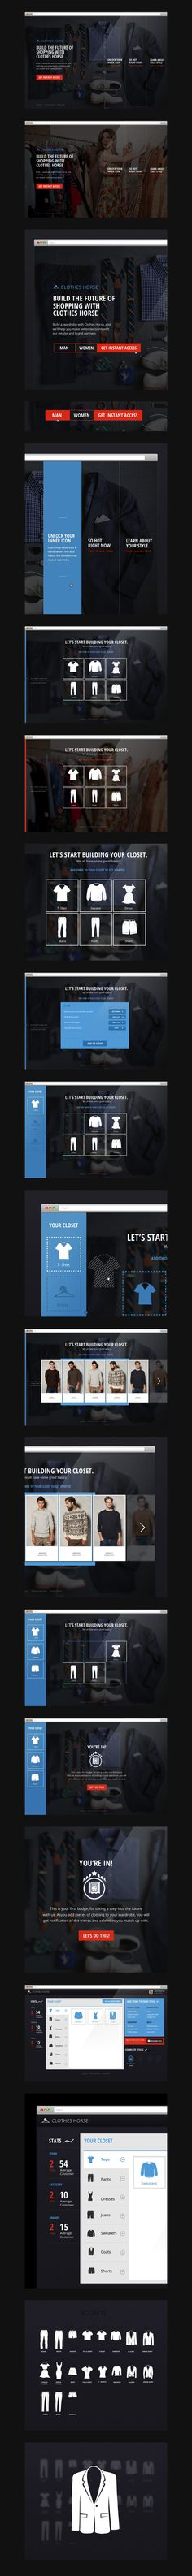 ClothesHorse 2013-11-30その五 未选中是虚线框 选中是实线框的图标按钮不错 重点在中间的图标设计